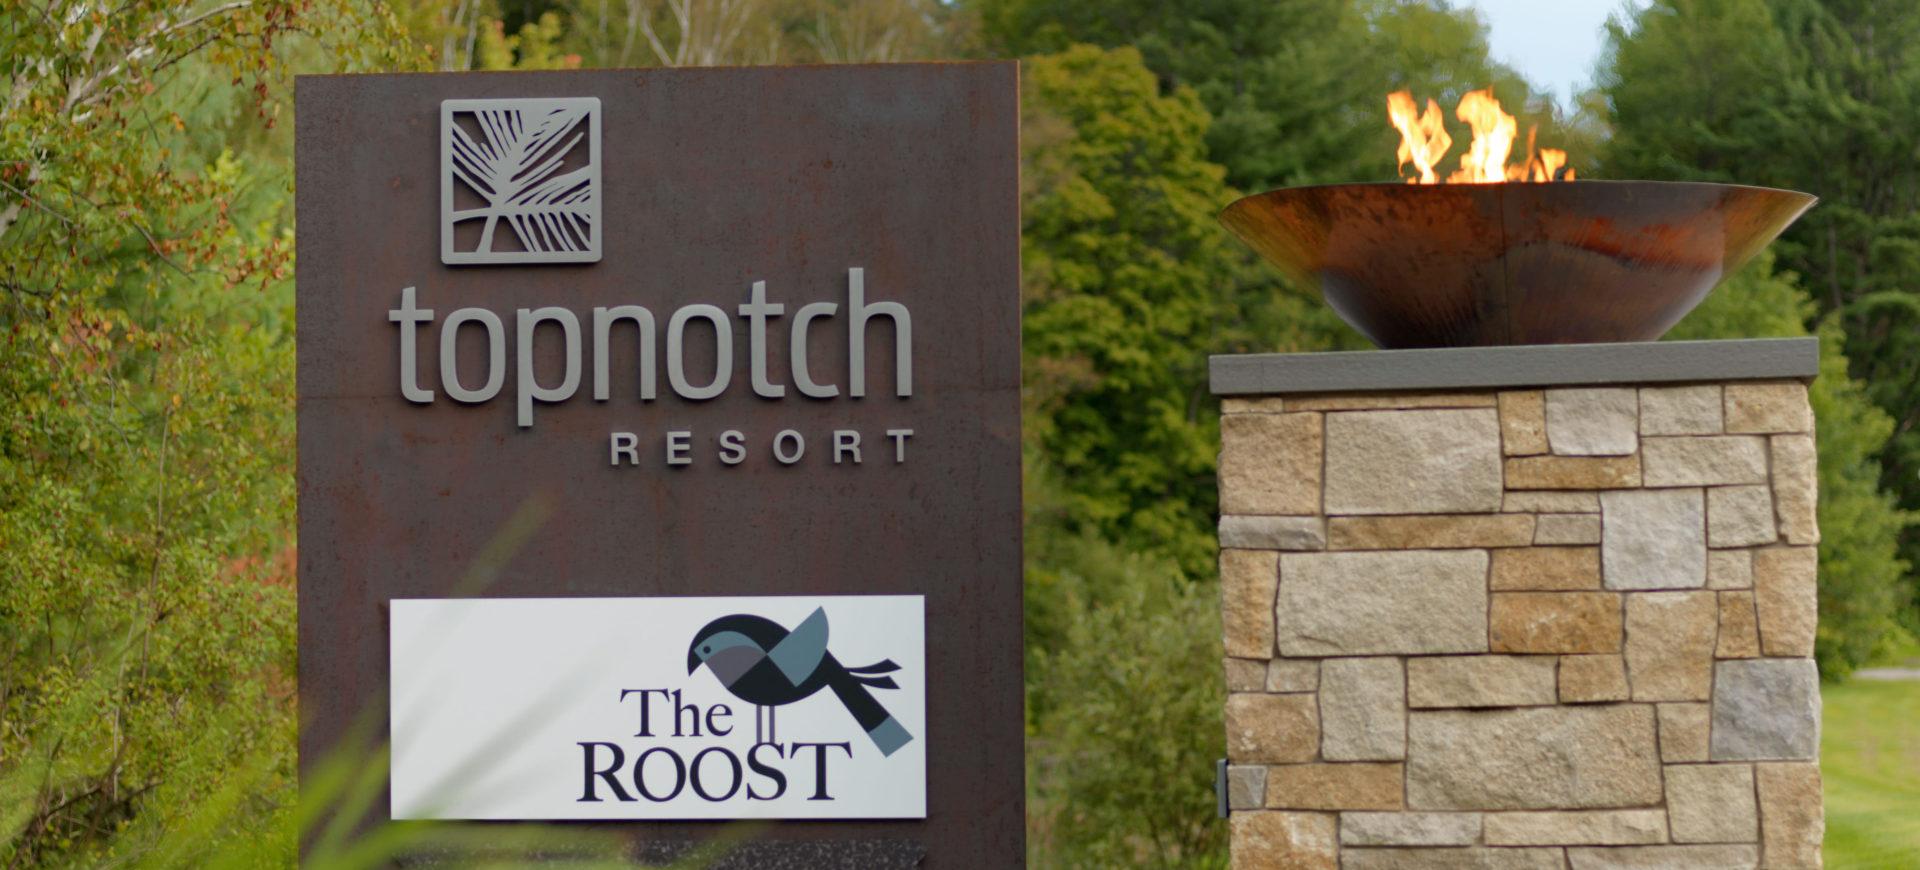 Commercial Landscape Maintenance - Top Notch Resort